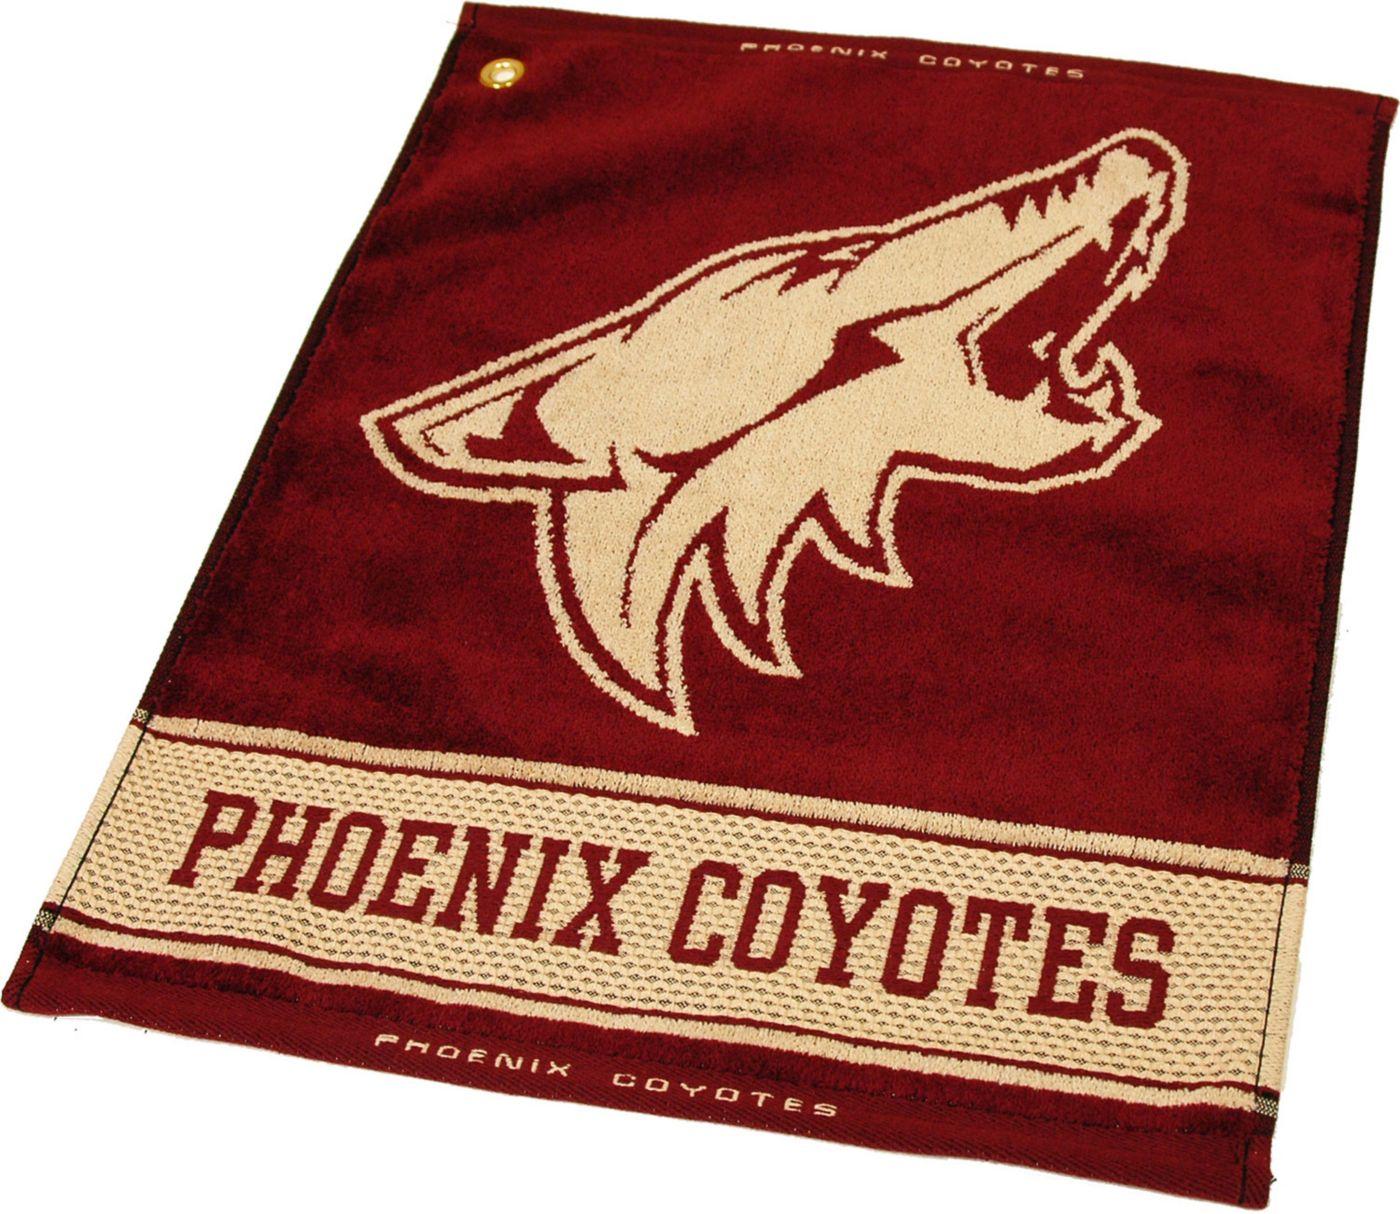 Team Golf Arizona Coyotes Woven Towel